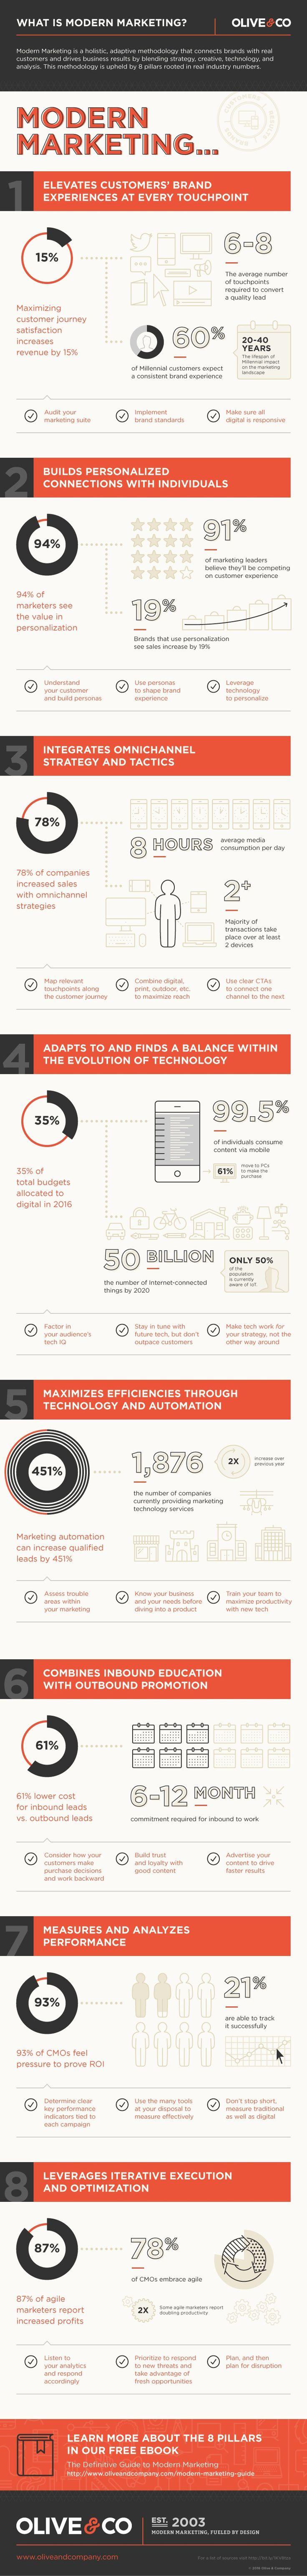 The 8 Pillars of Modern Marketing #Infographic